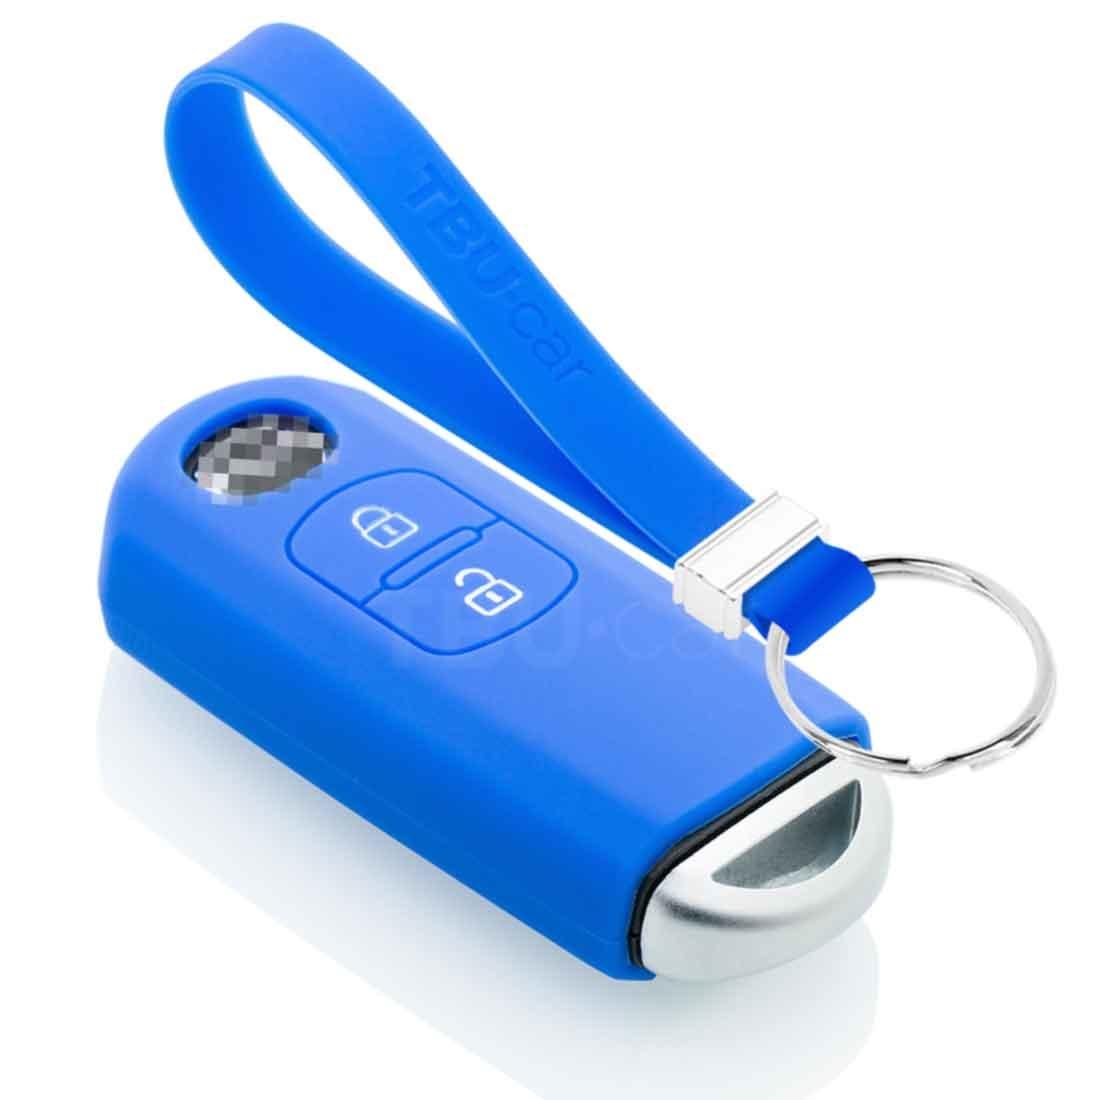 TBU car TBU car Autoschlüssel Hülle kompatibel mit Mazda 2 Tasten (Keyless Entry) - Schutzhülle aus Silikon - Auto Schlüsselhülle Cover in Blau